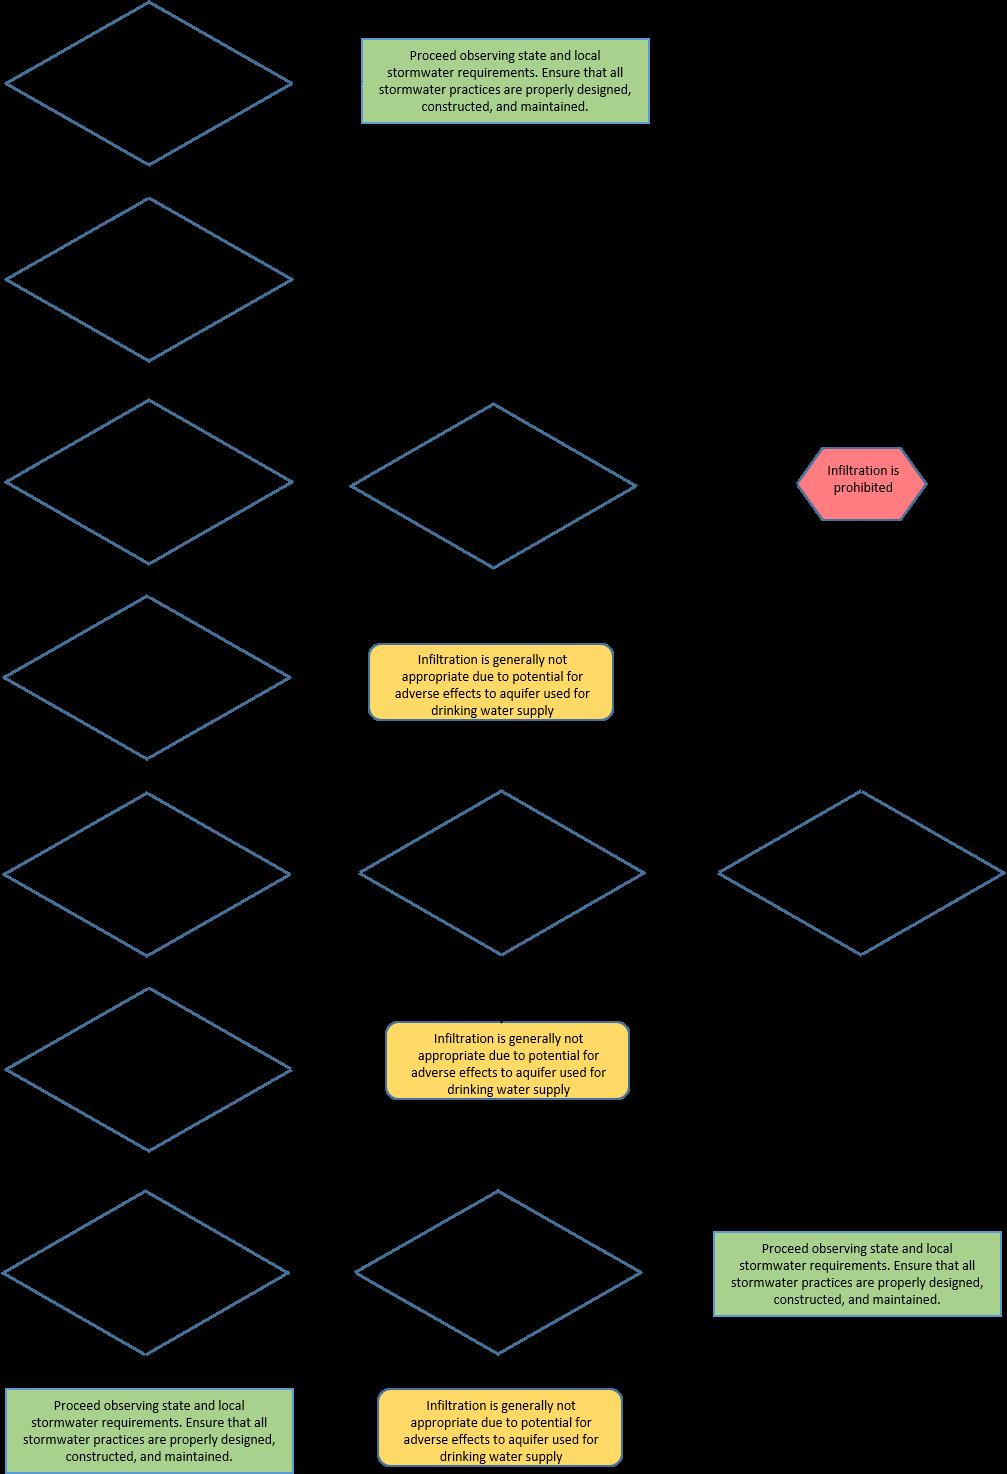 Flow_chart_ _MDH_Guidance_for_DWSMAs_2018_b file flow chart mdh guidance for dwsmas 2018 b png minnesota